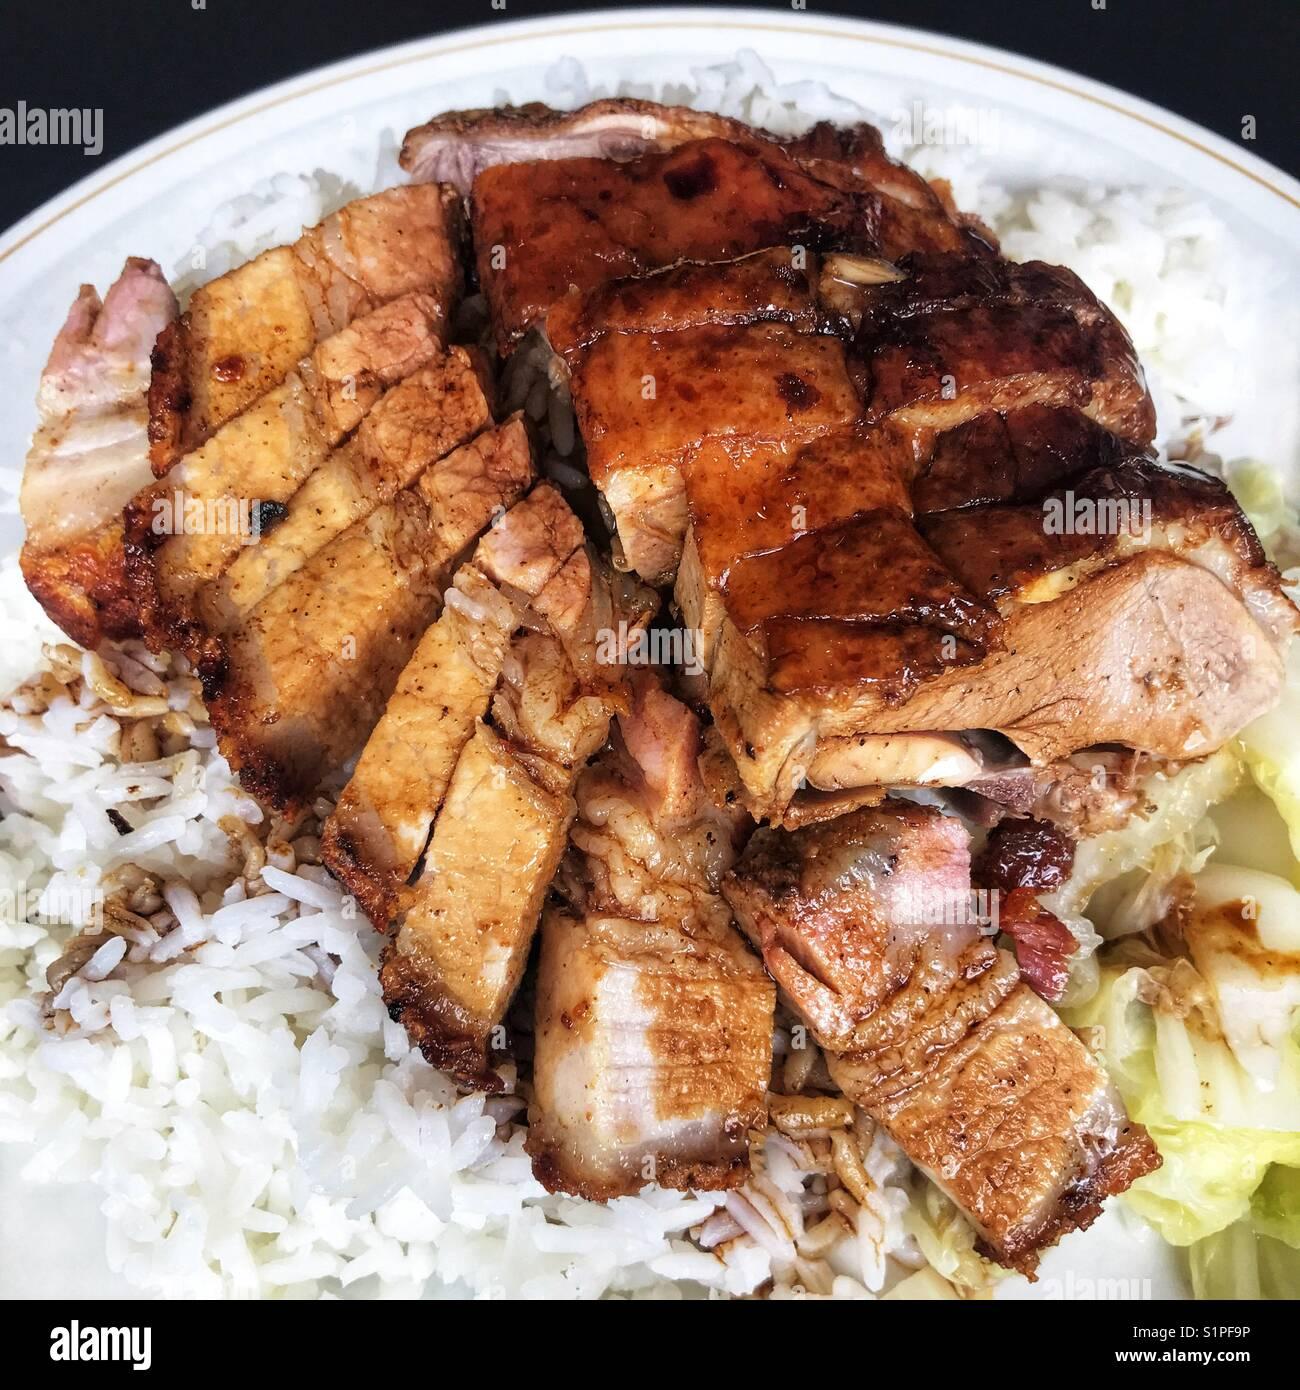 Cantonese roast duck and crispy pork belly rice - Stock Image